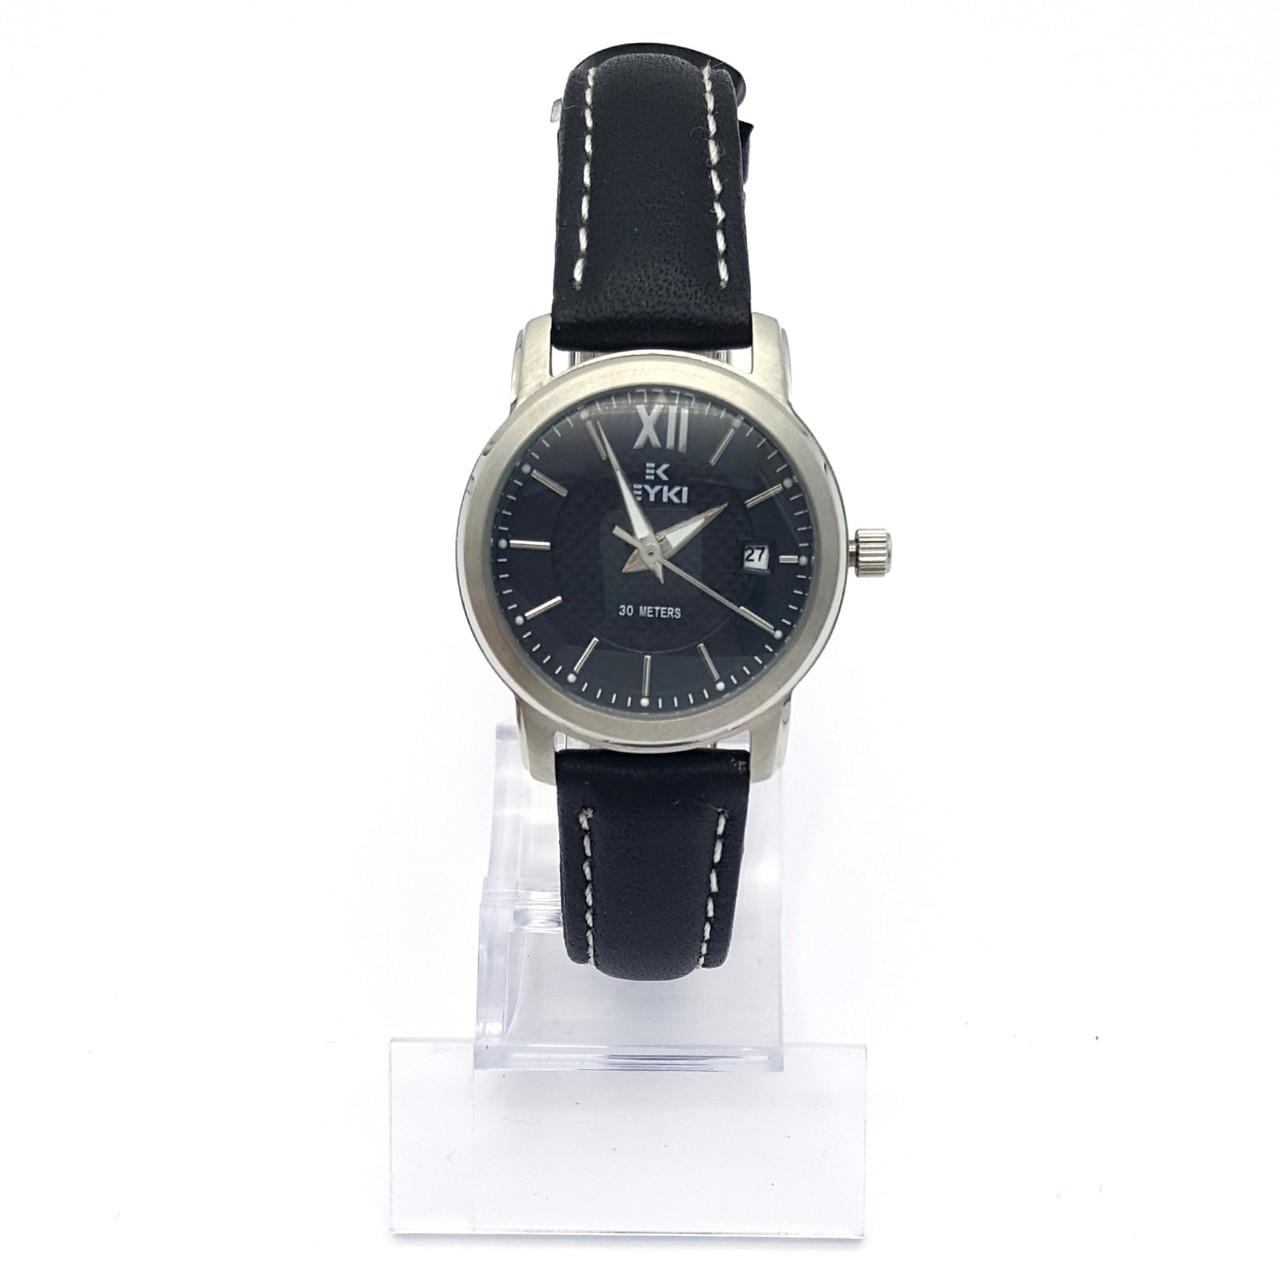 Часы EYKI Серебристые, на черном ремешке, длина 14,5-19см, циферблат 28